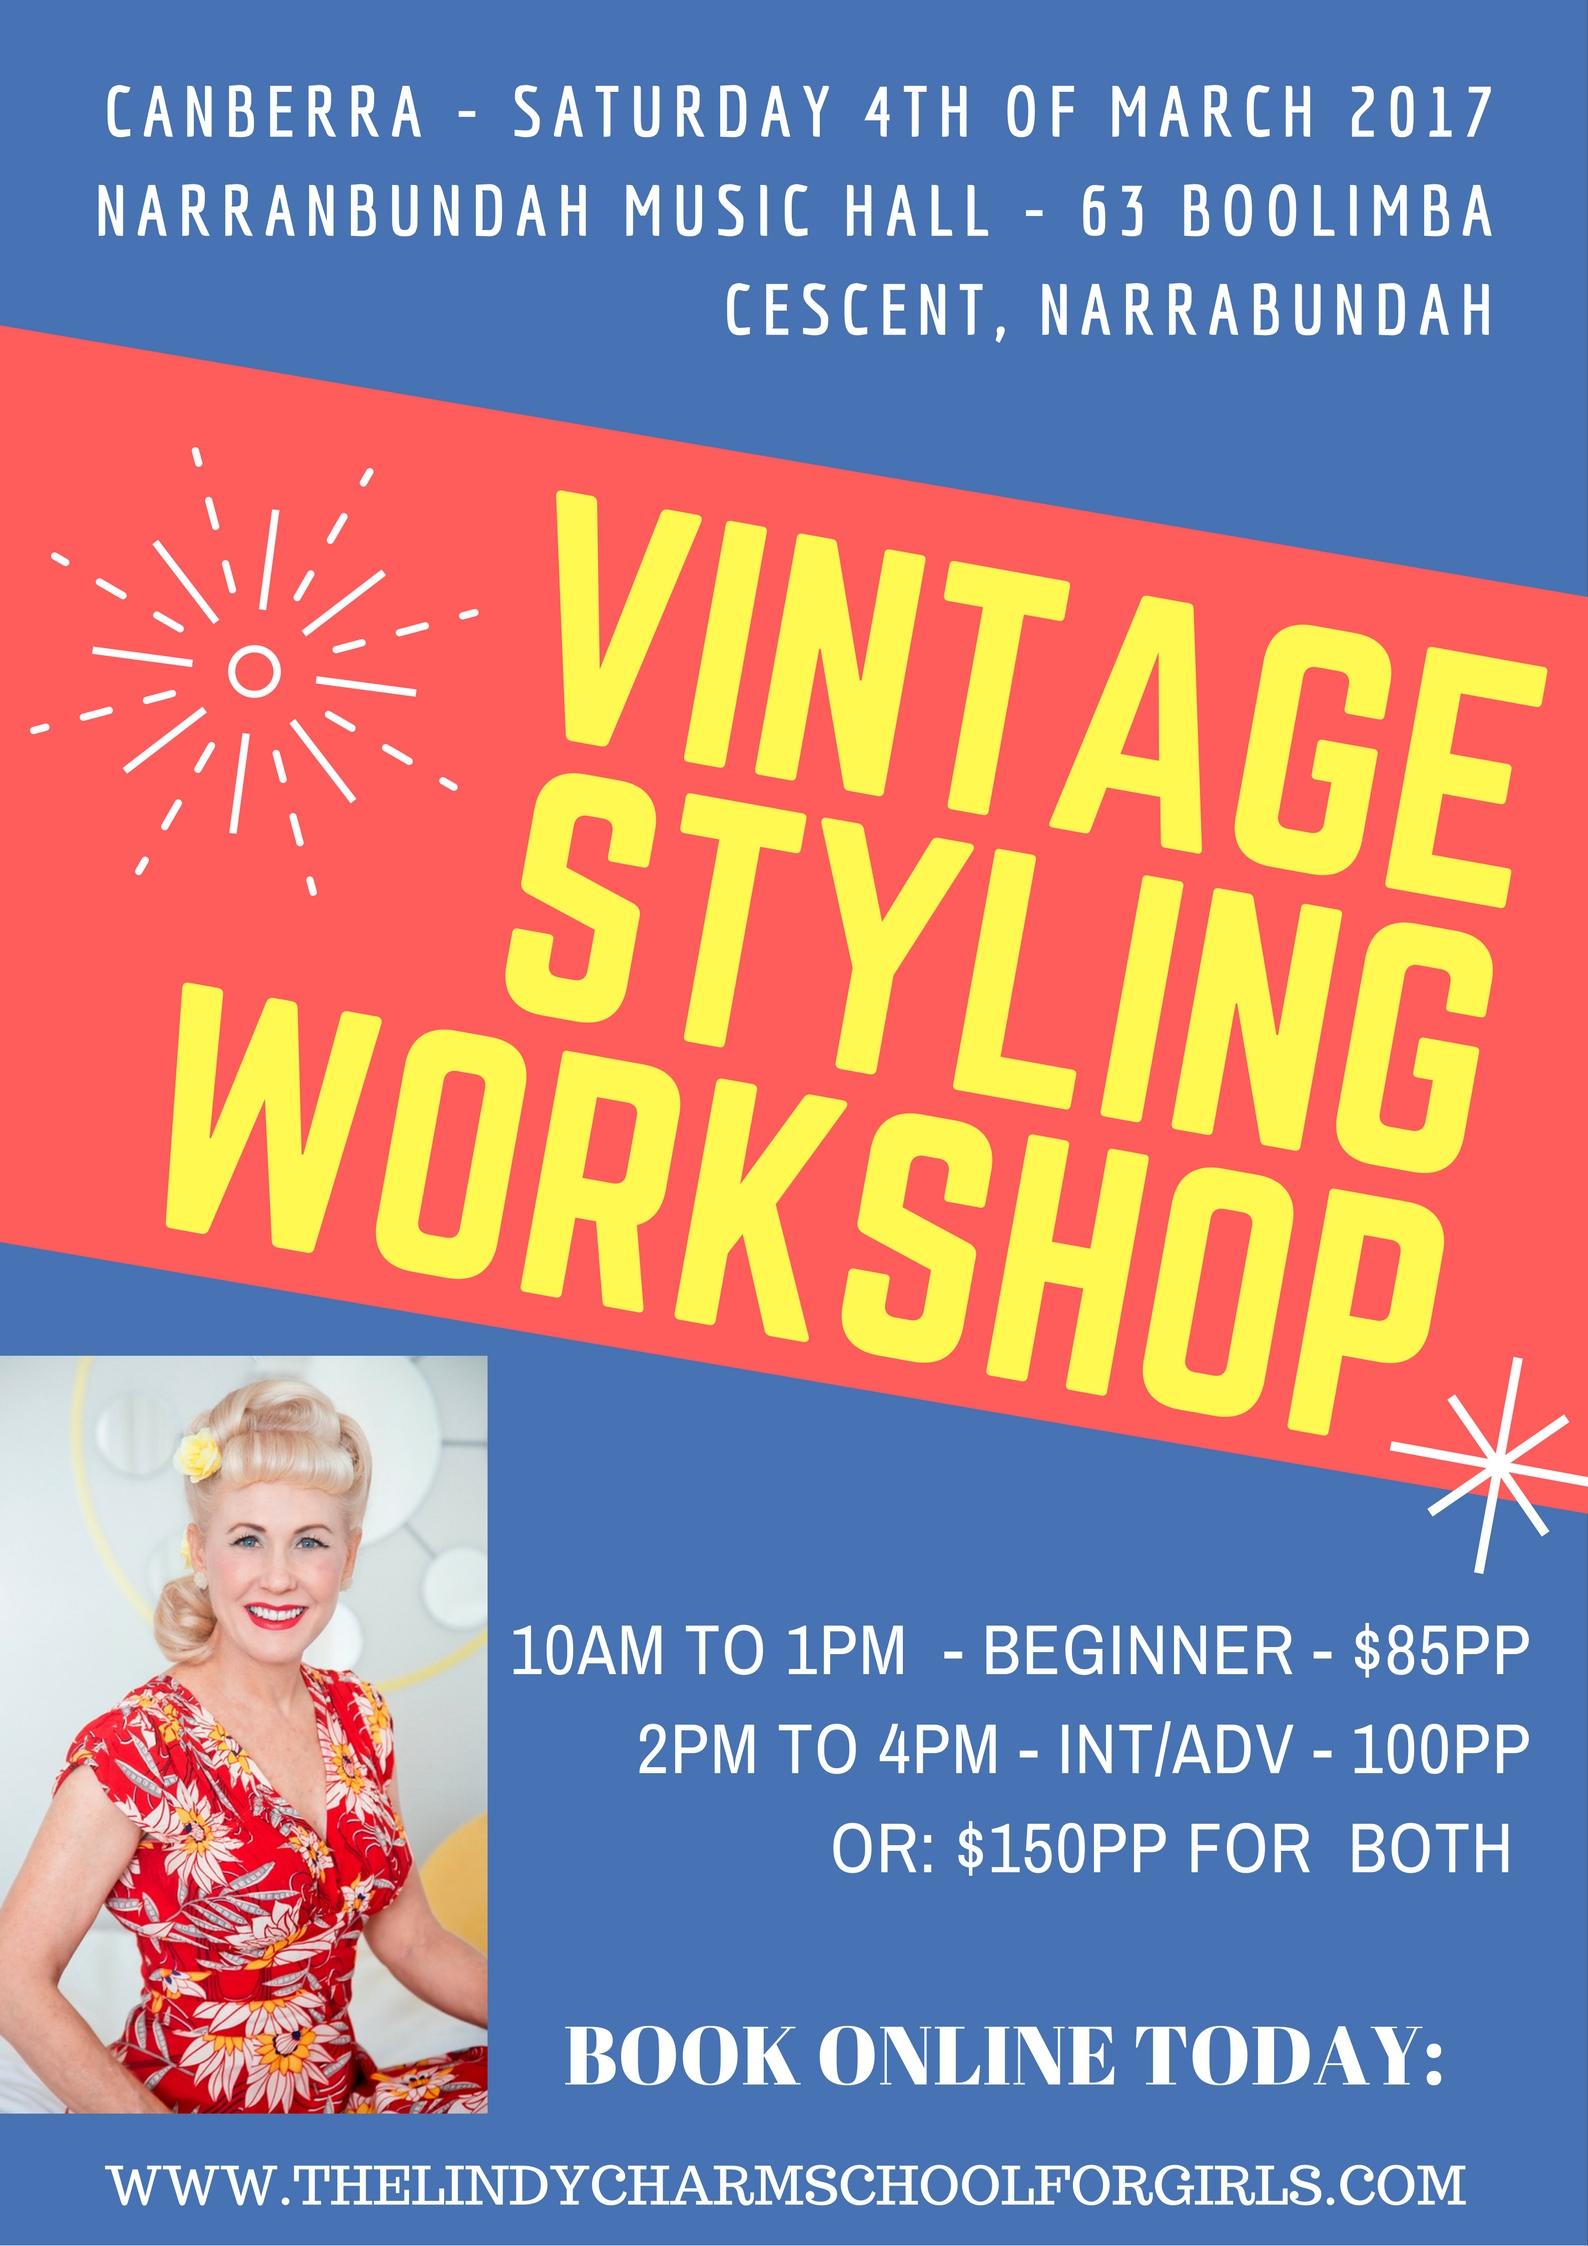 08b254b820 Vintage/Retro/Pinup Hair and Makeup Workshops - Saturday 4 March ...